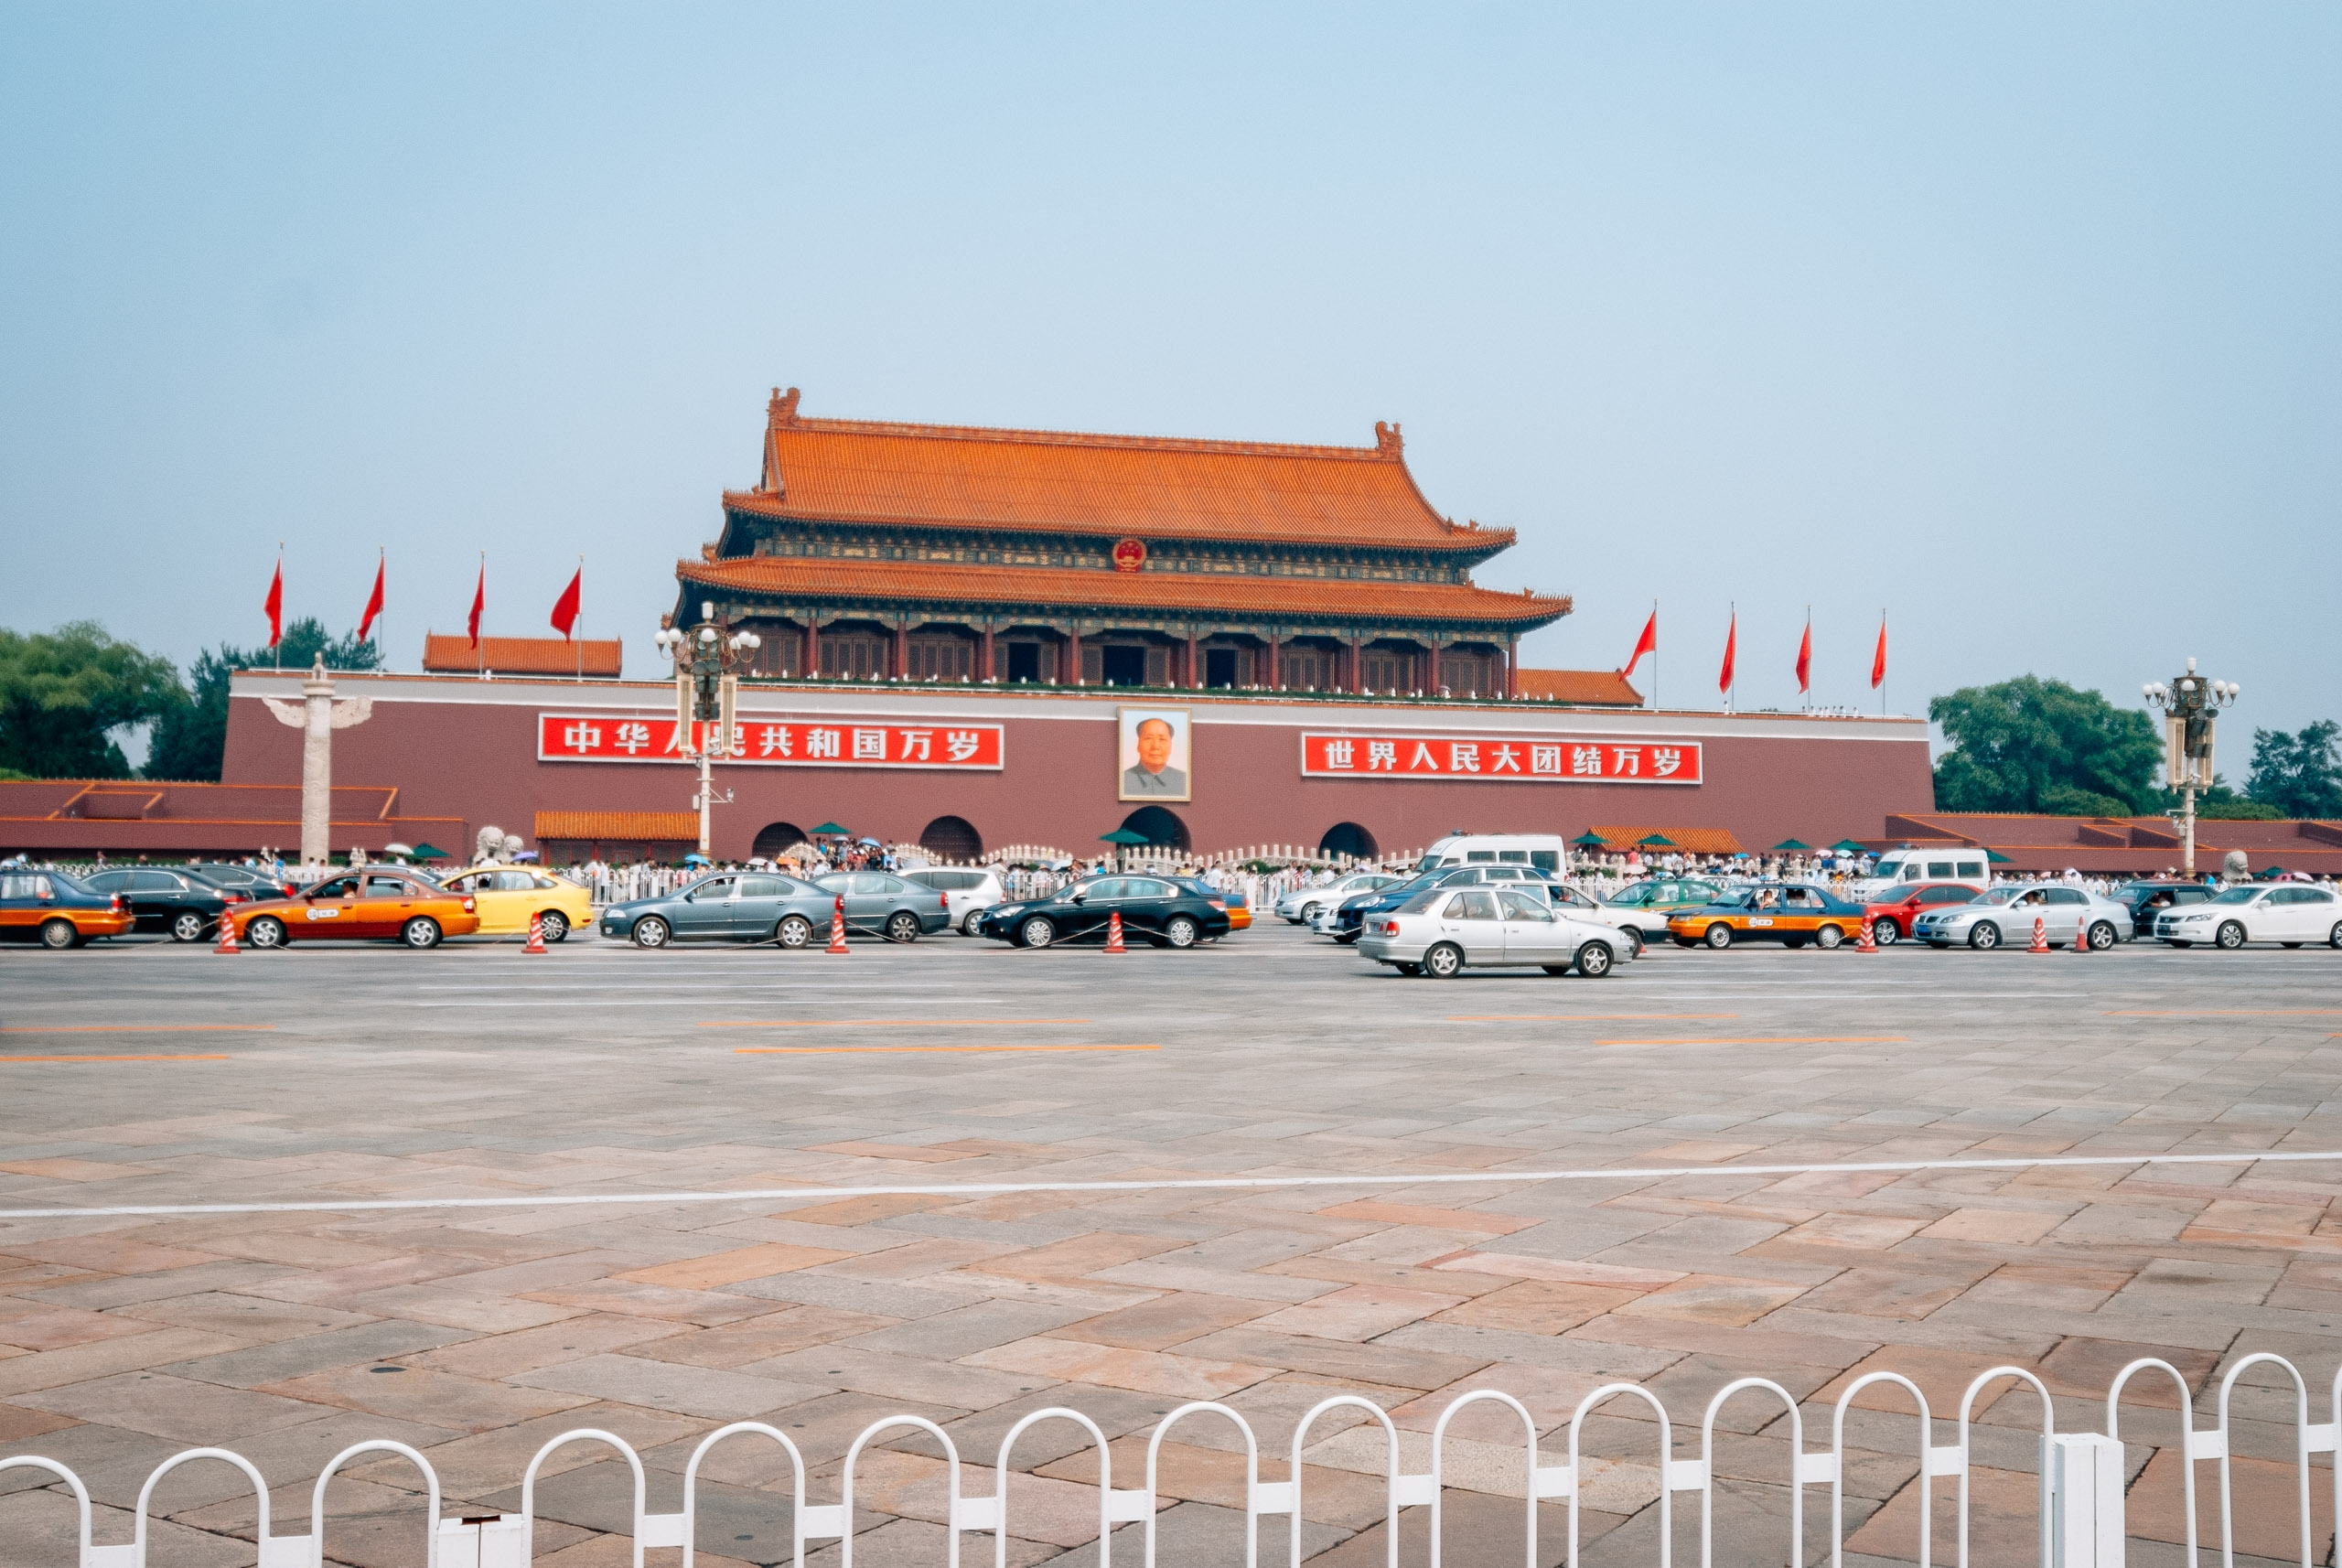 China - Beijing & The Great Wall - 2010-0903-DSC_0294_103885